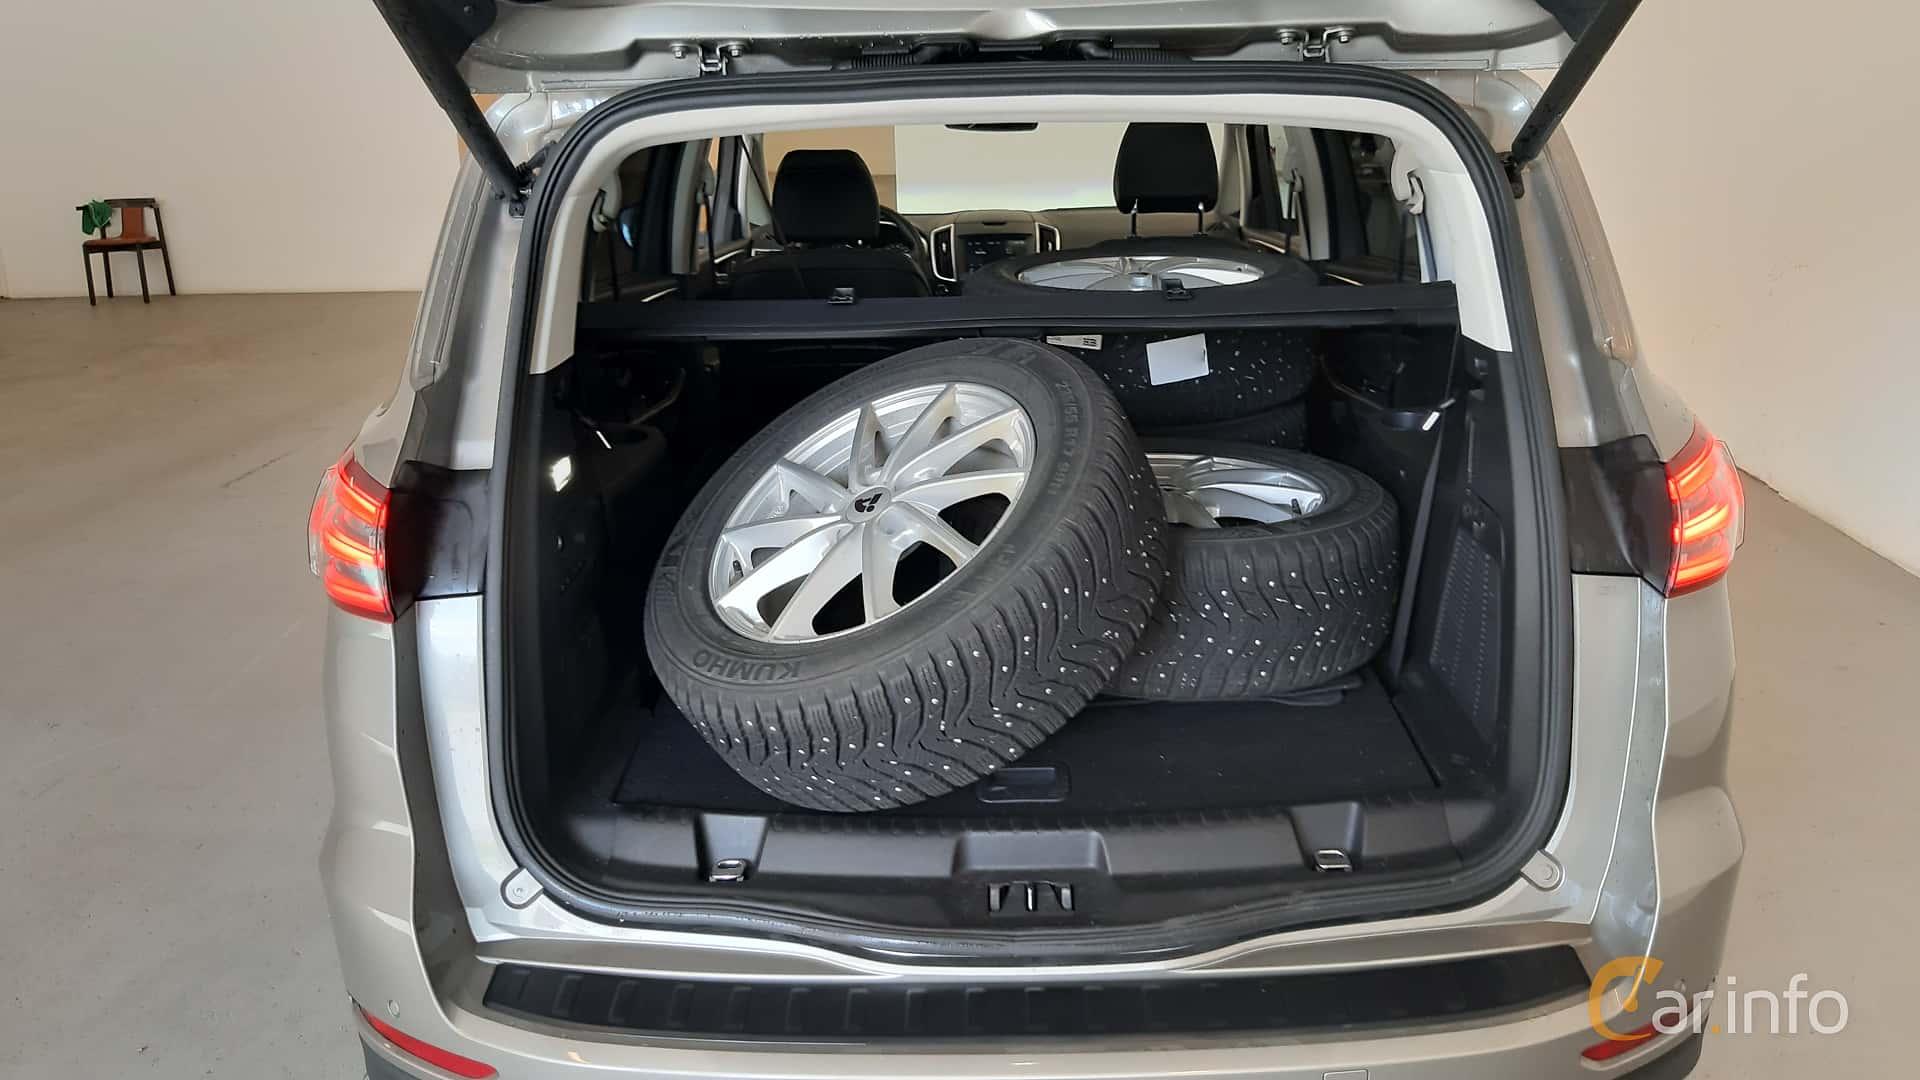 Ford S-Max 2.0 TDCi AWD Powershift, 180hp, 2017